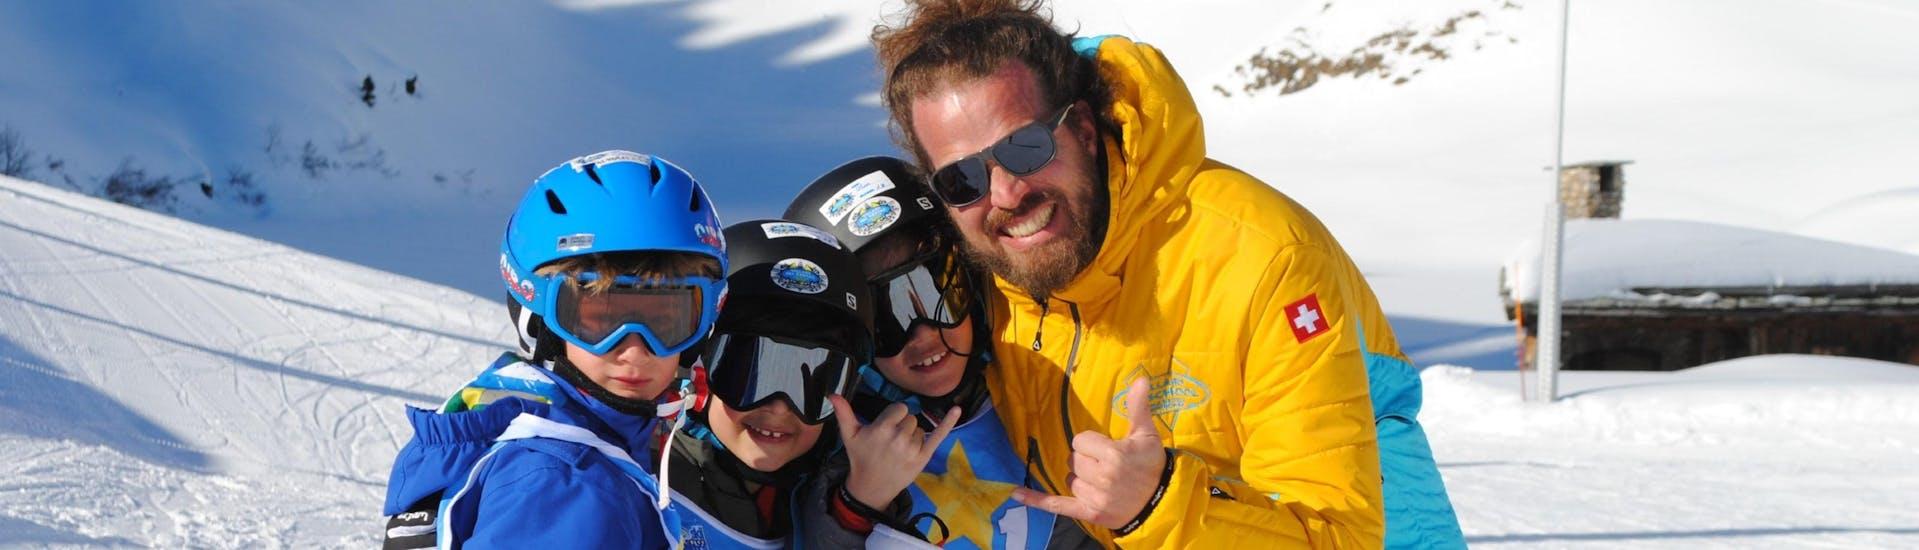 kids-ski-lessons-3-16-years-villars-ski-school-hero